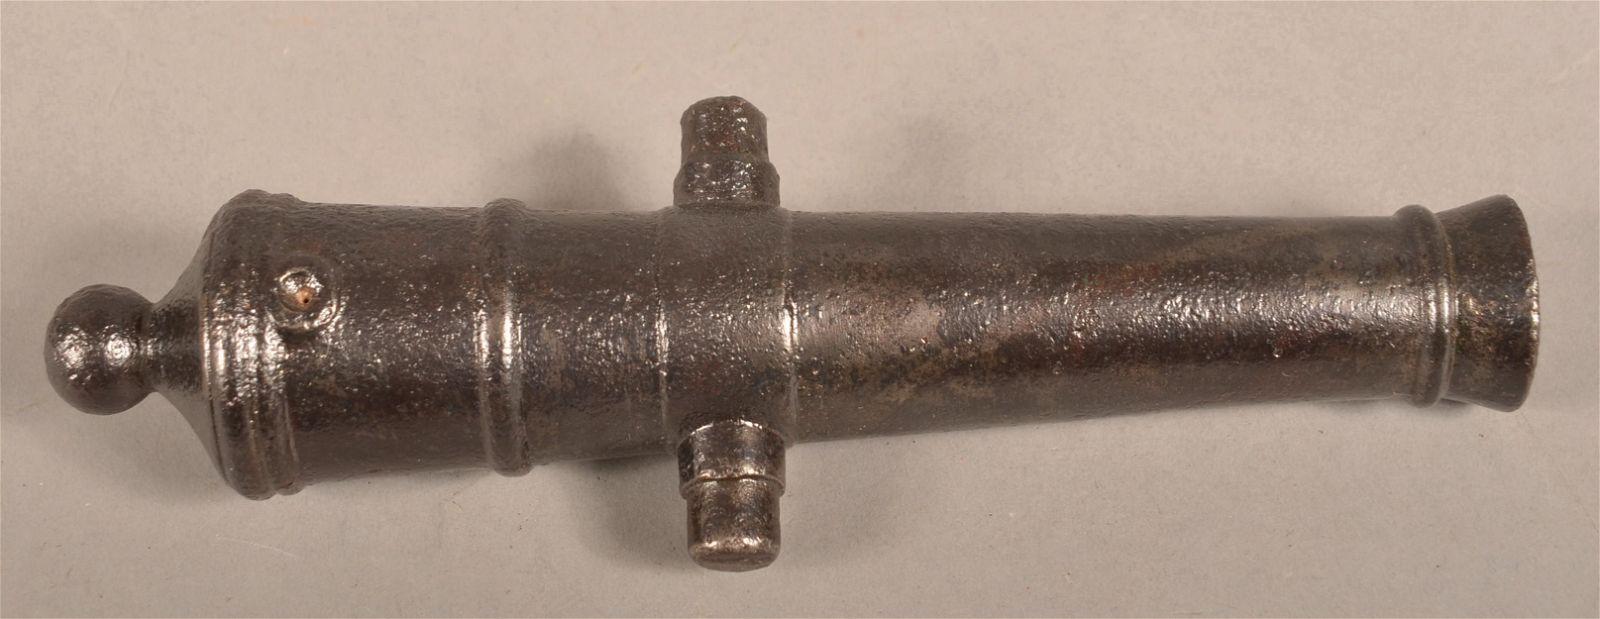 Antique Muzzle Loading Cast Iron Signal Cannon.